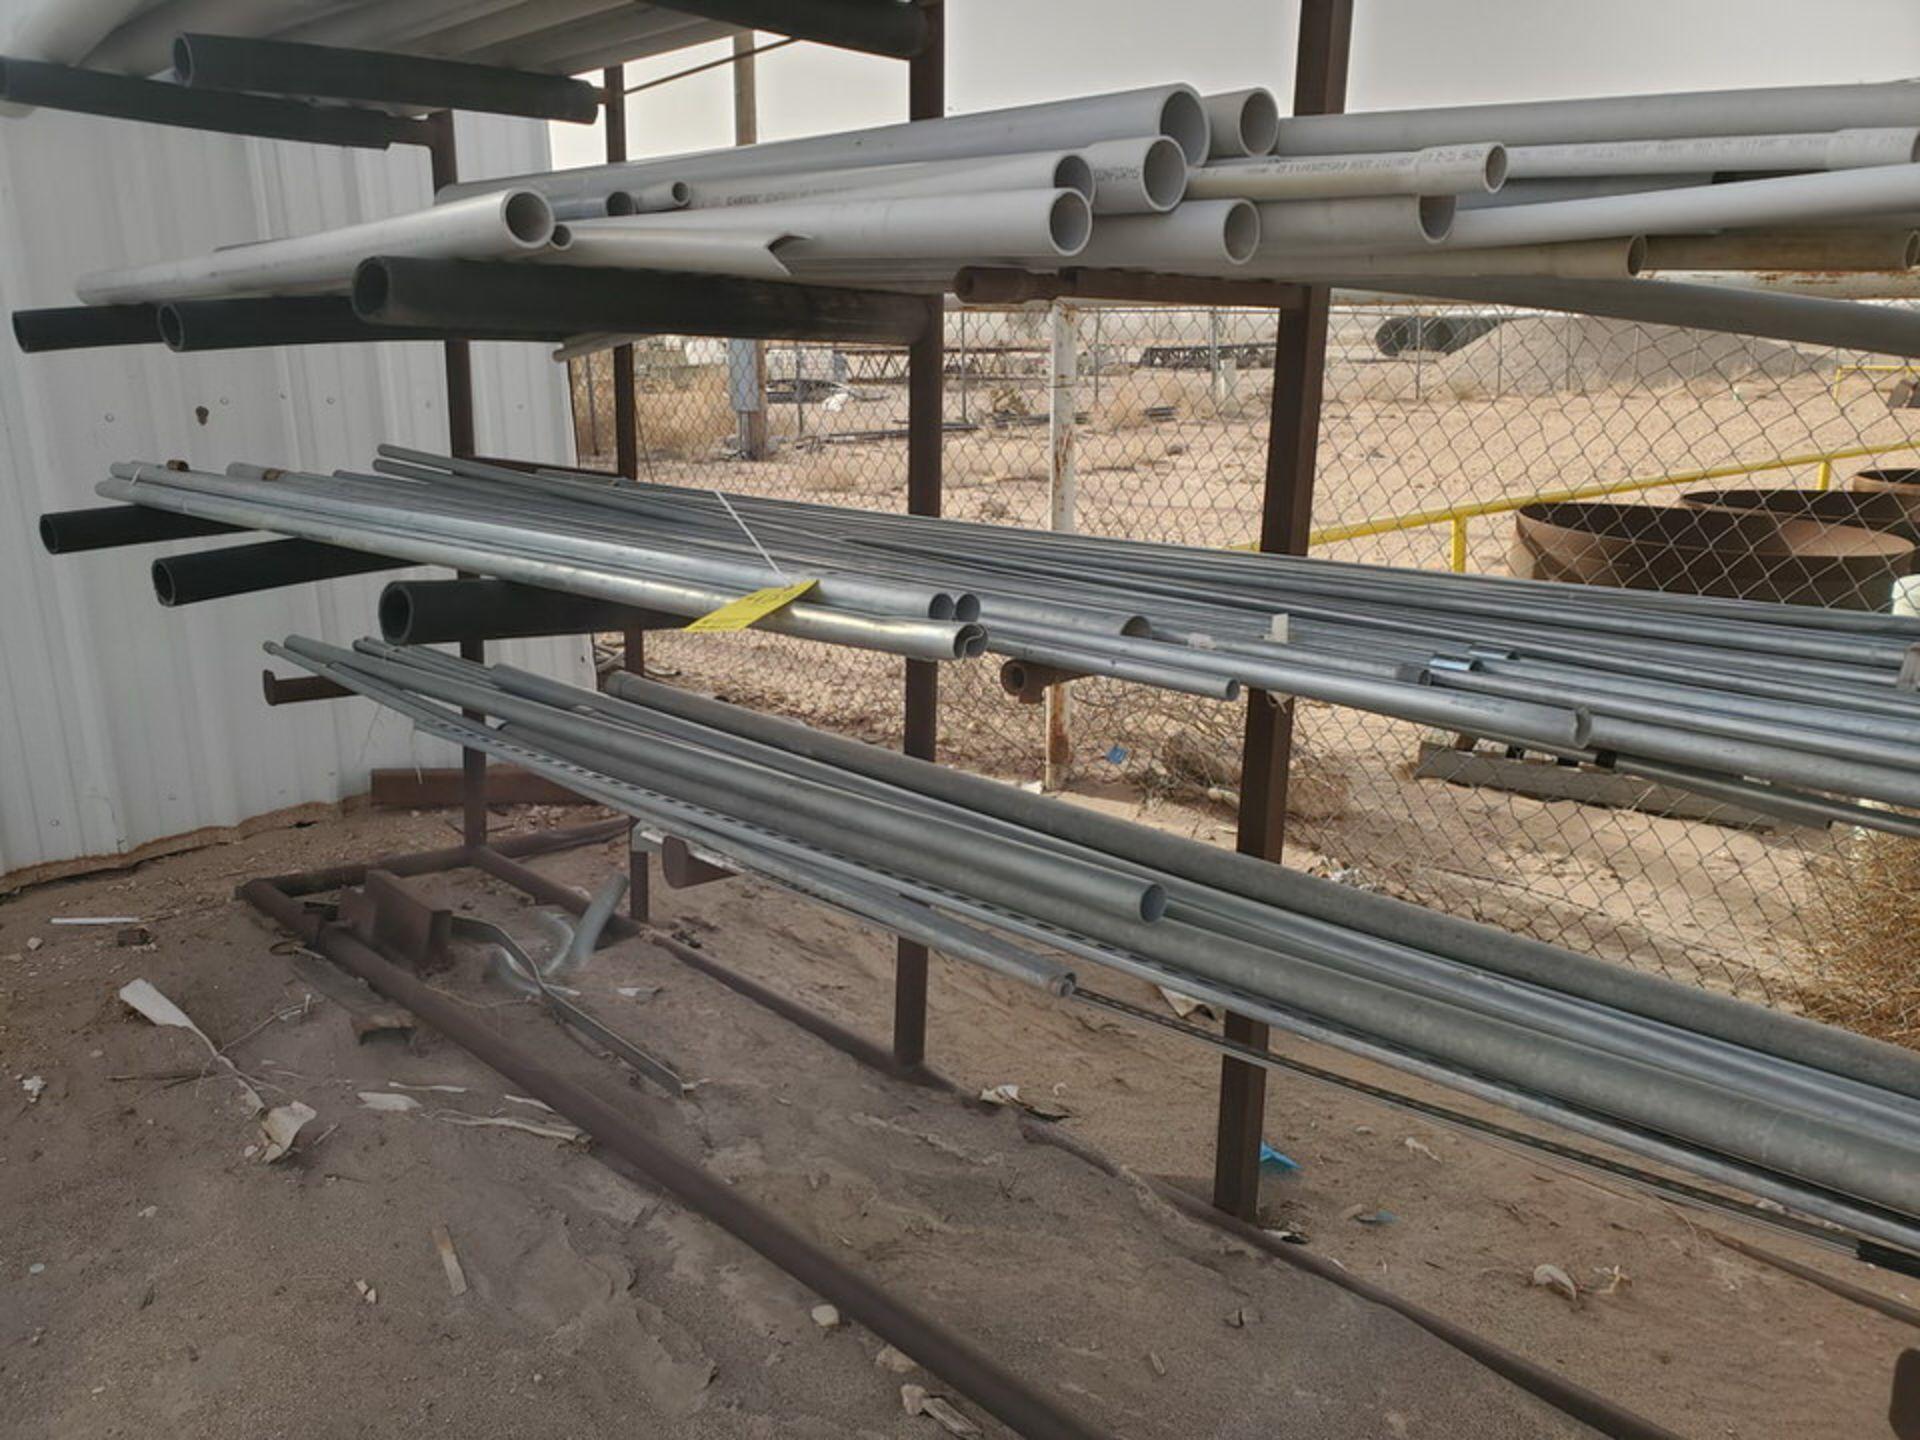 "PVC & Alum. Pipe W/ Conduit Size Range: 1/2"" - 4"" W/ Rack - Image 9 of 18"